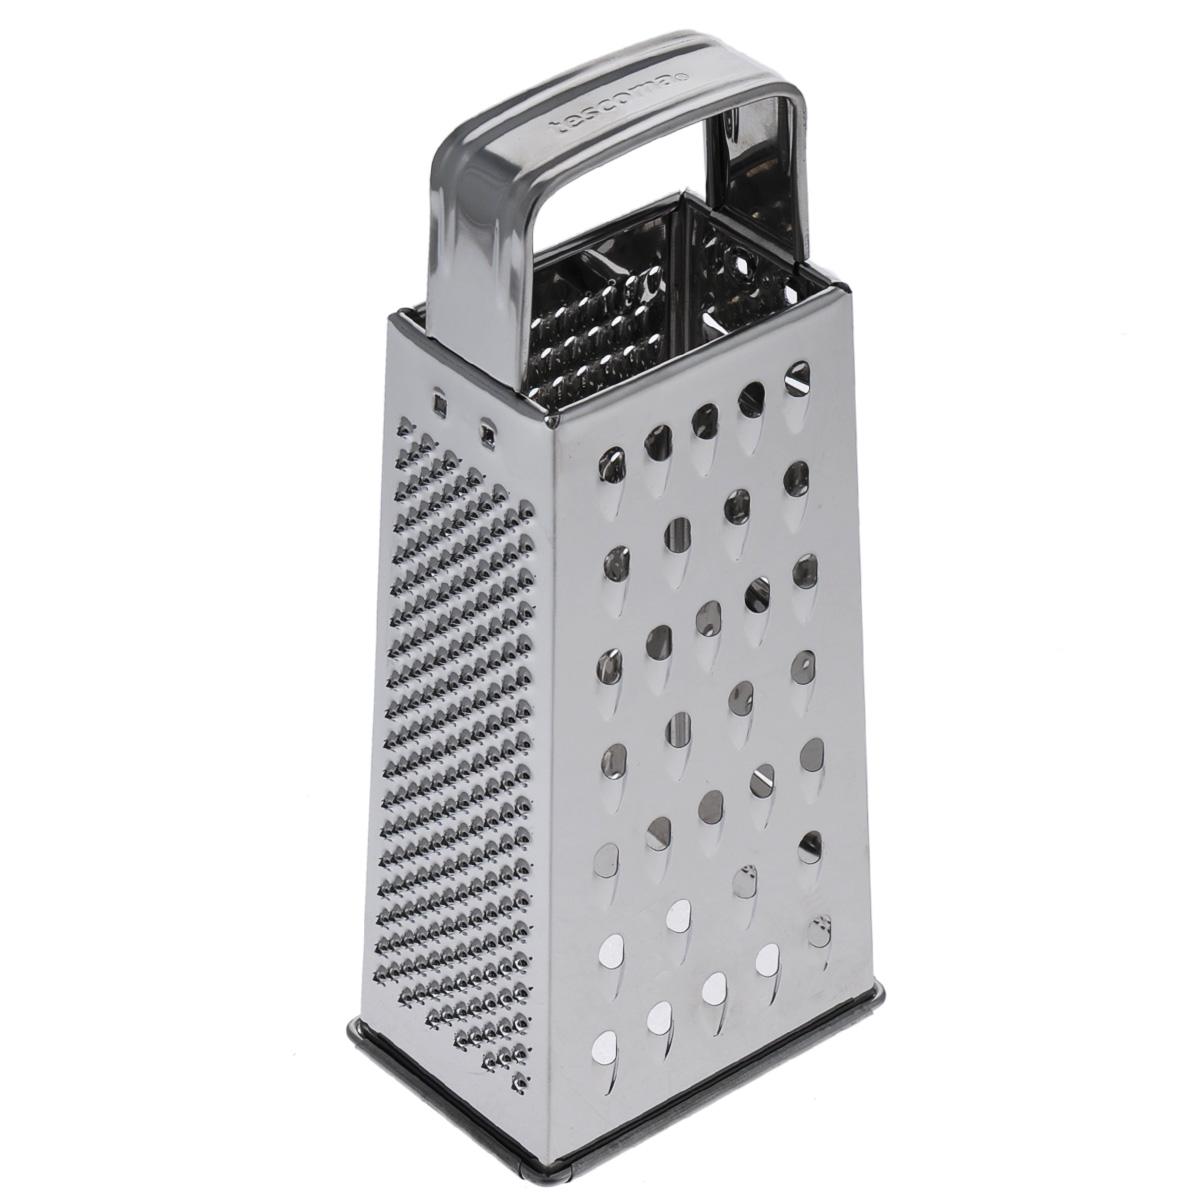 Терка четырехгранная Tescoma Handy, высота 23 см advu 12 20 a p a advu 12 25 a p a advu 12 30 a p a festo compact cylinders